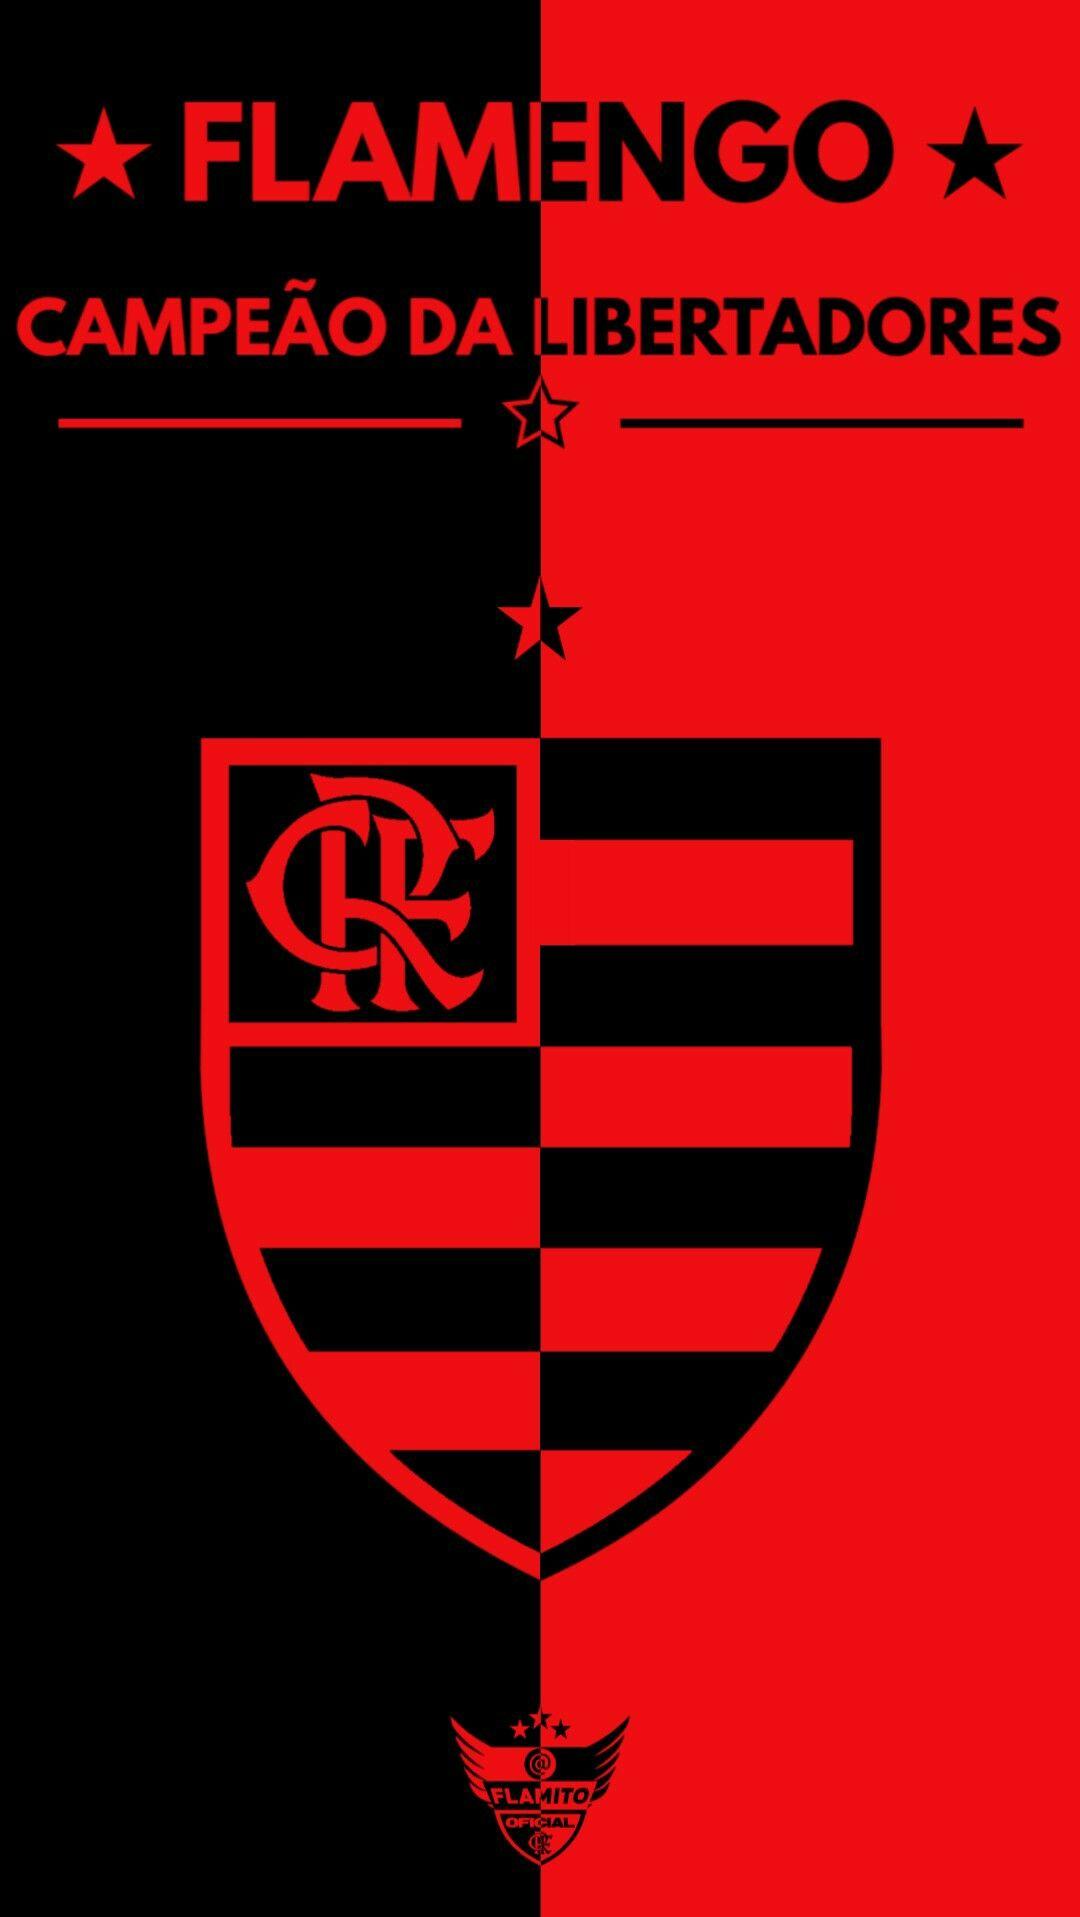 Pin De Dieysoon Campana Em Naruto Uzumaki Flamengo Adidas